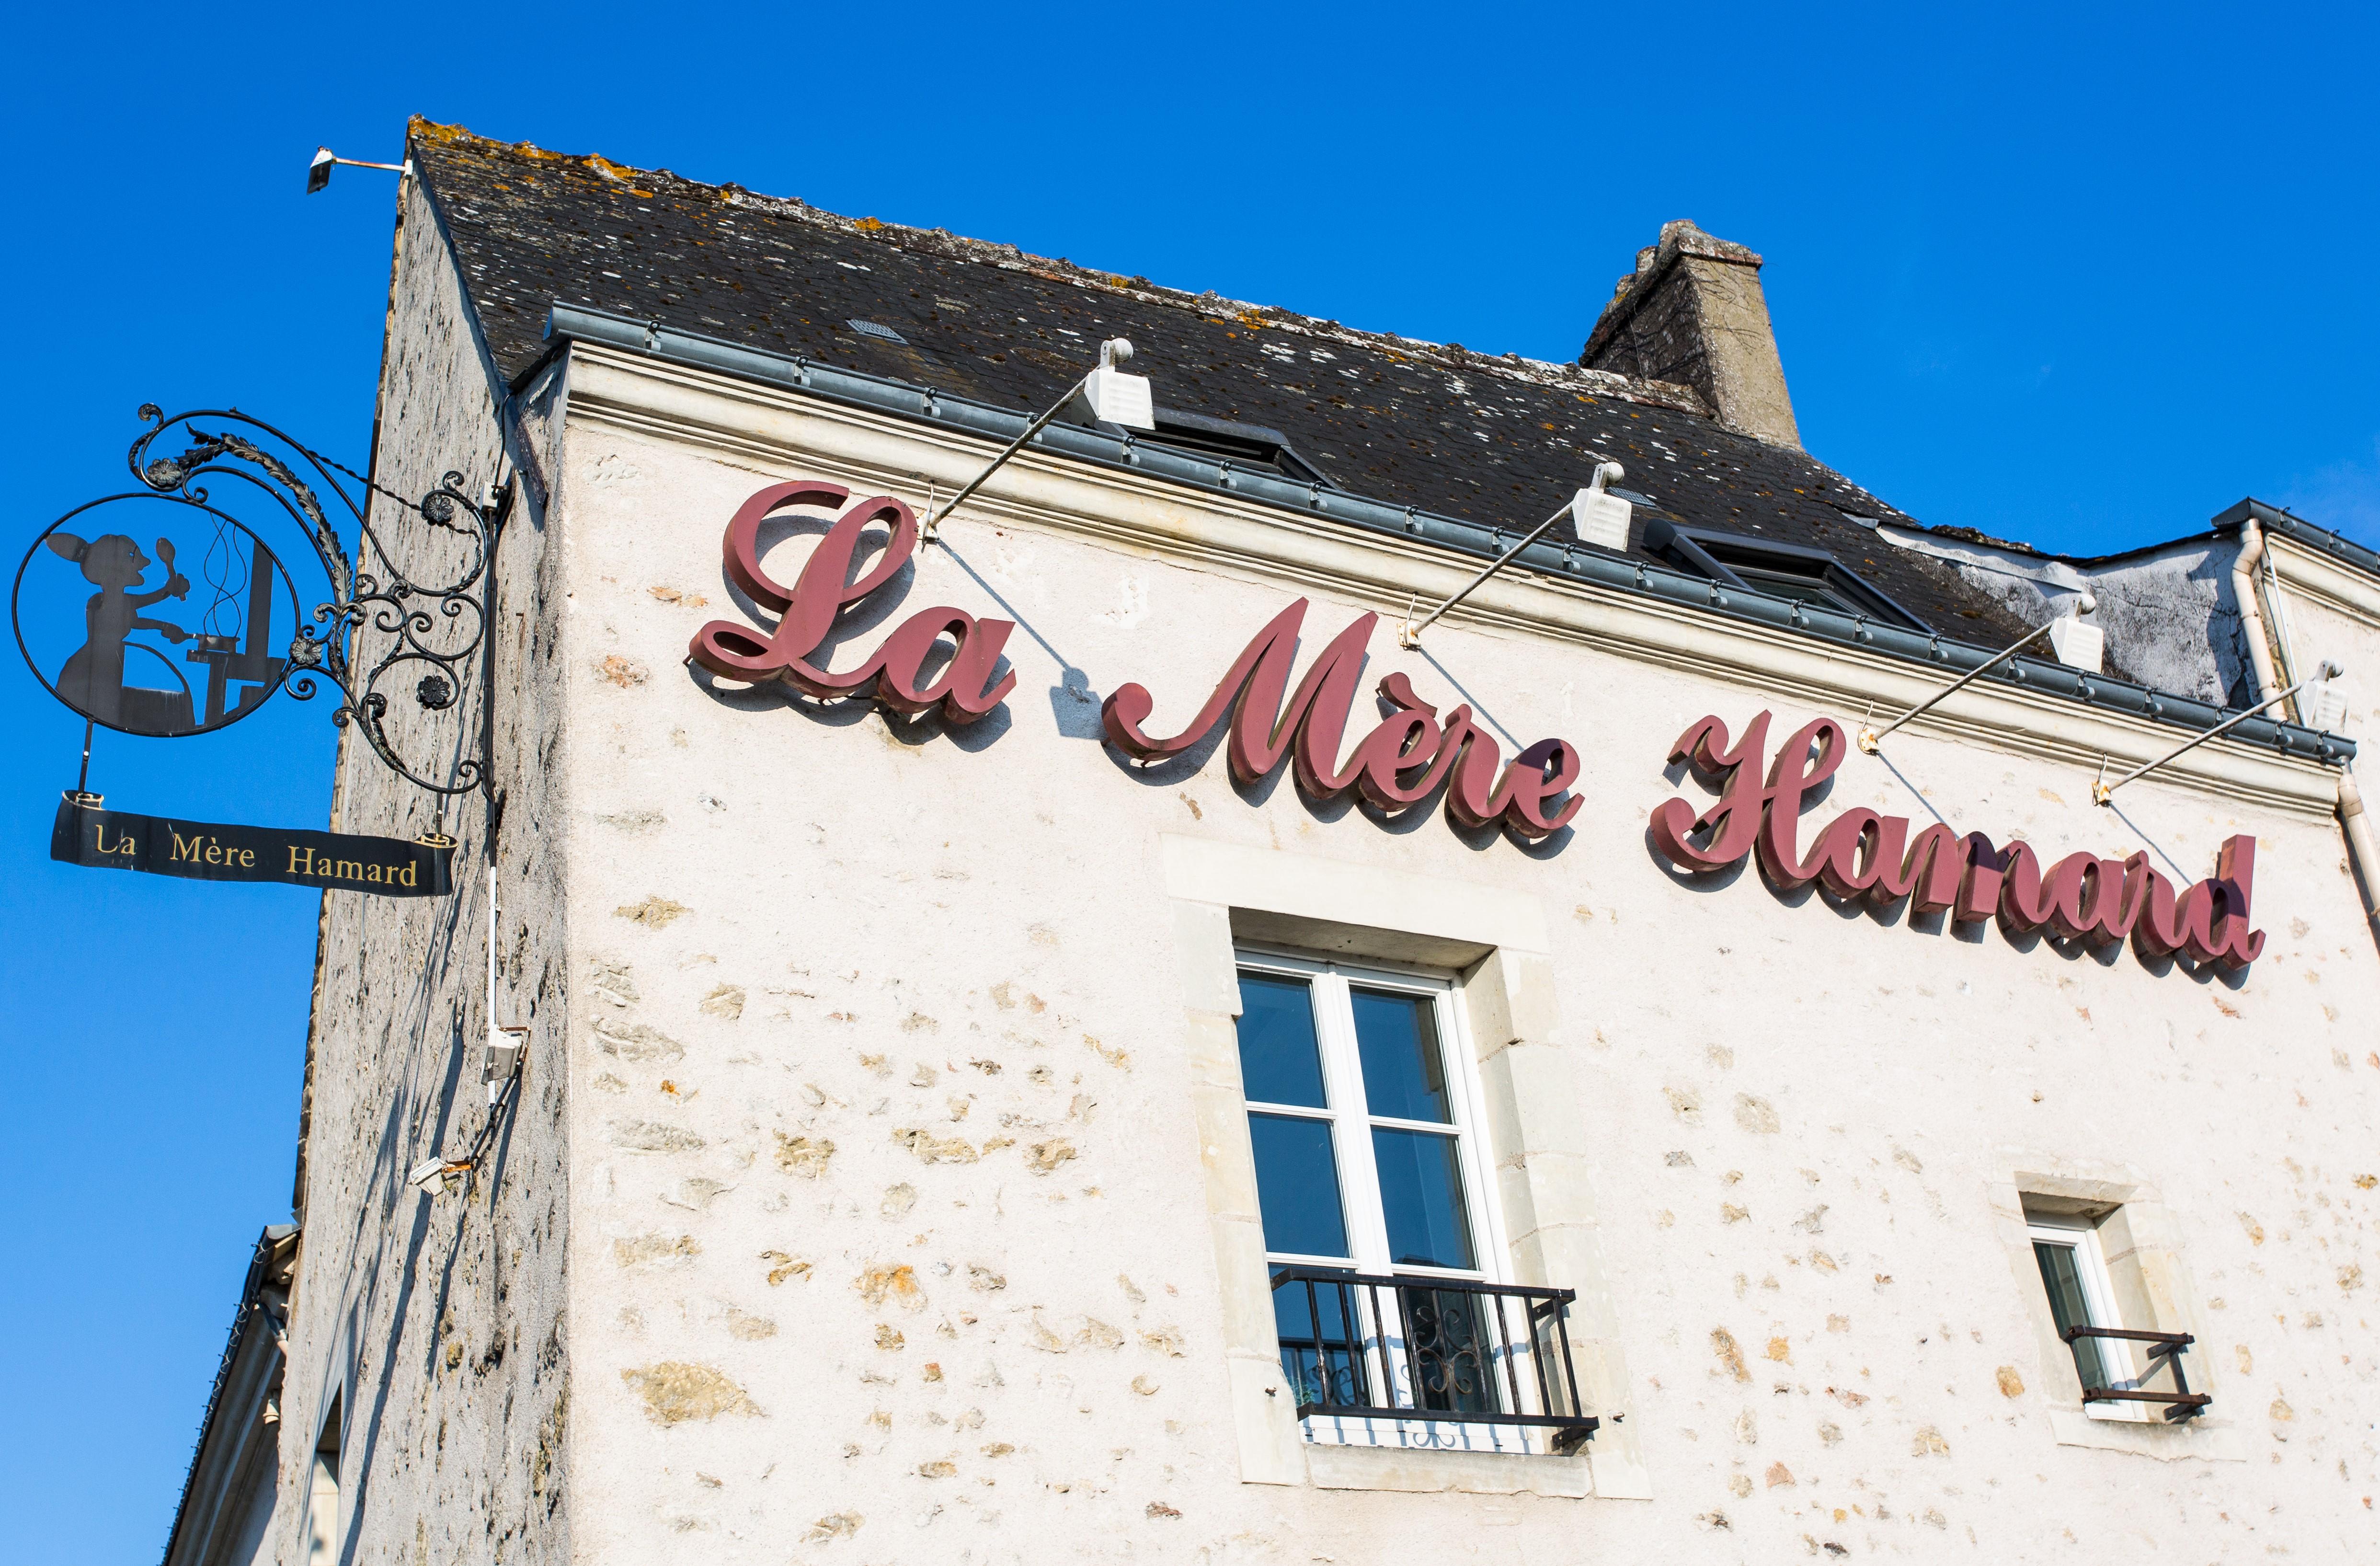 Adhérent LA MERE HAMARD  - photo #13919